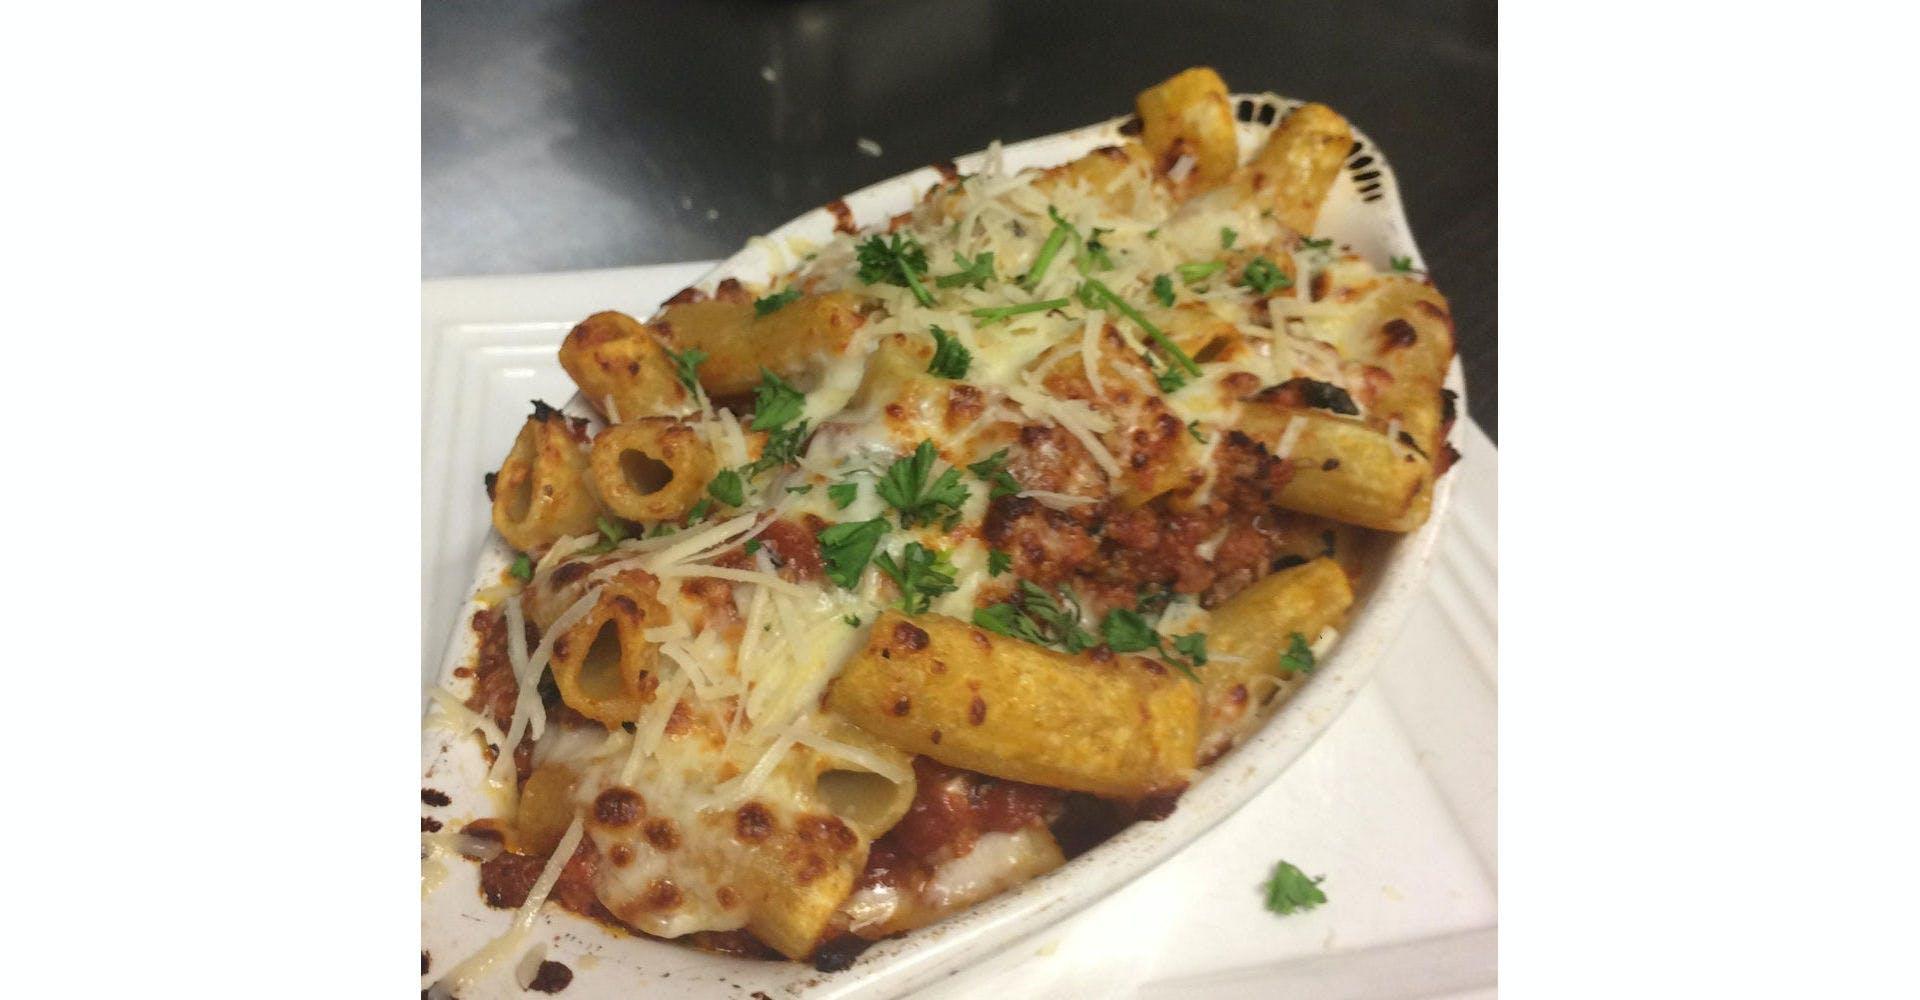 Ziti from Grazies Italian Grill in Stevens Point, WI